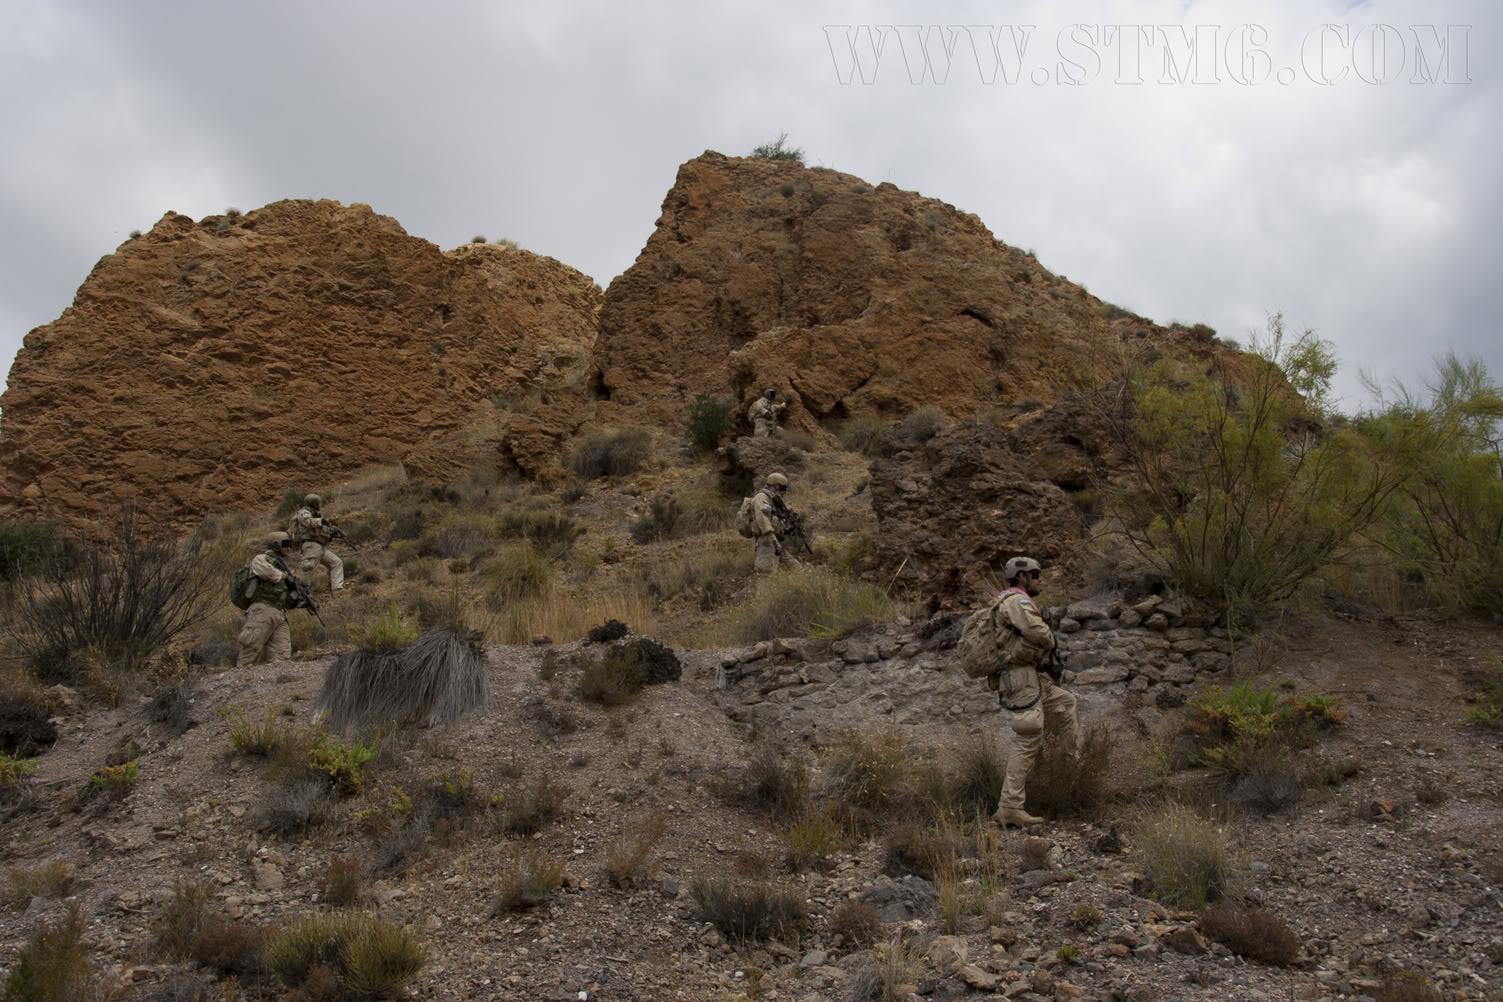 The Fallen Warriors - In honour of the fallen in OP. RW.  Reenactment moderno 2005 6e03928a